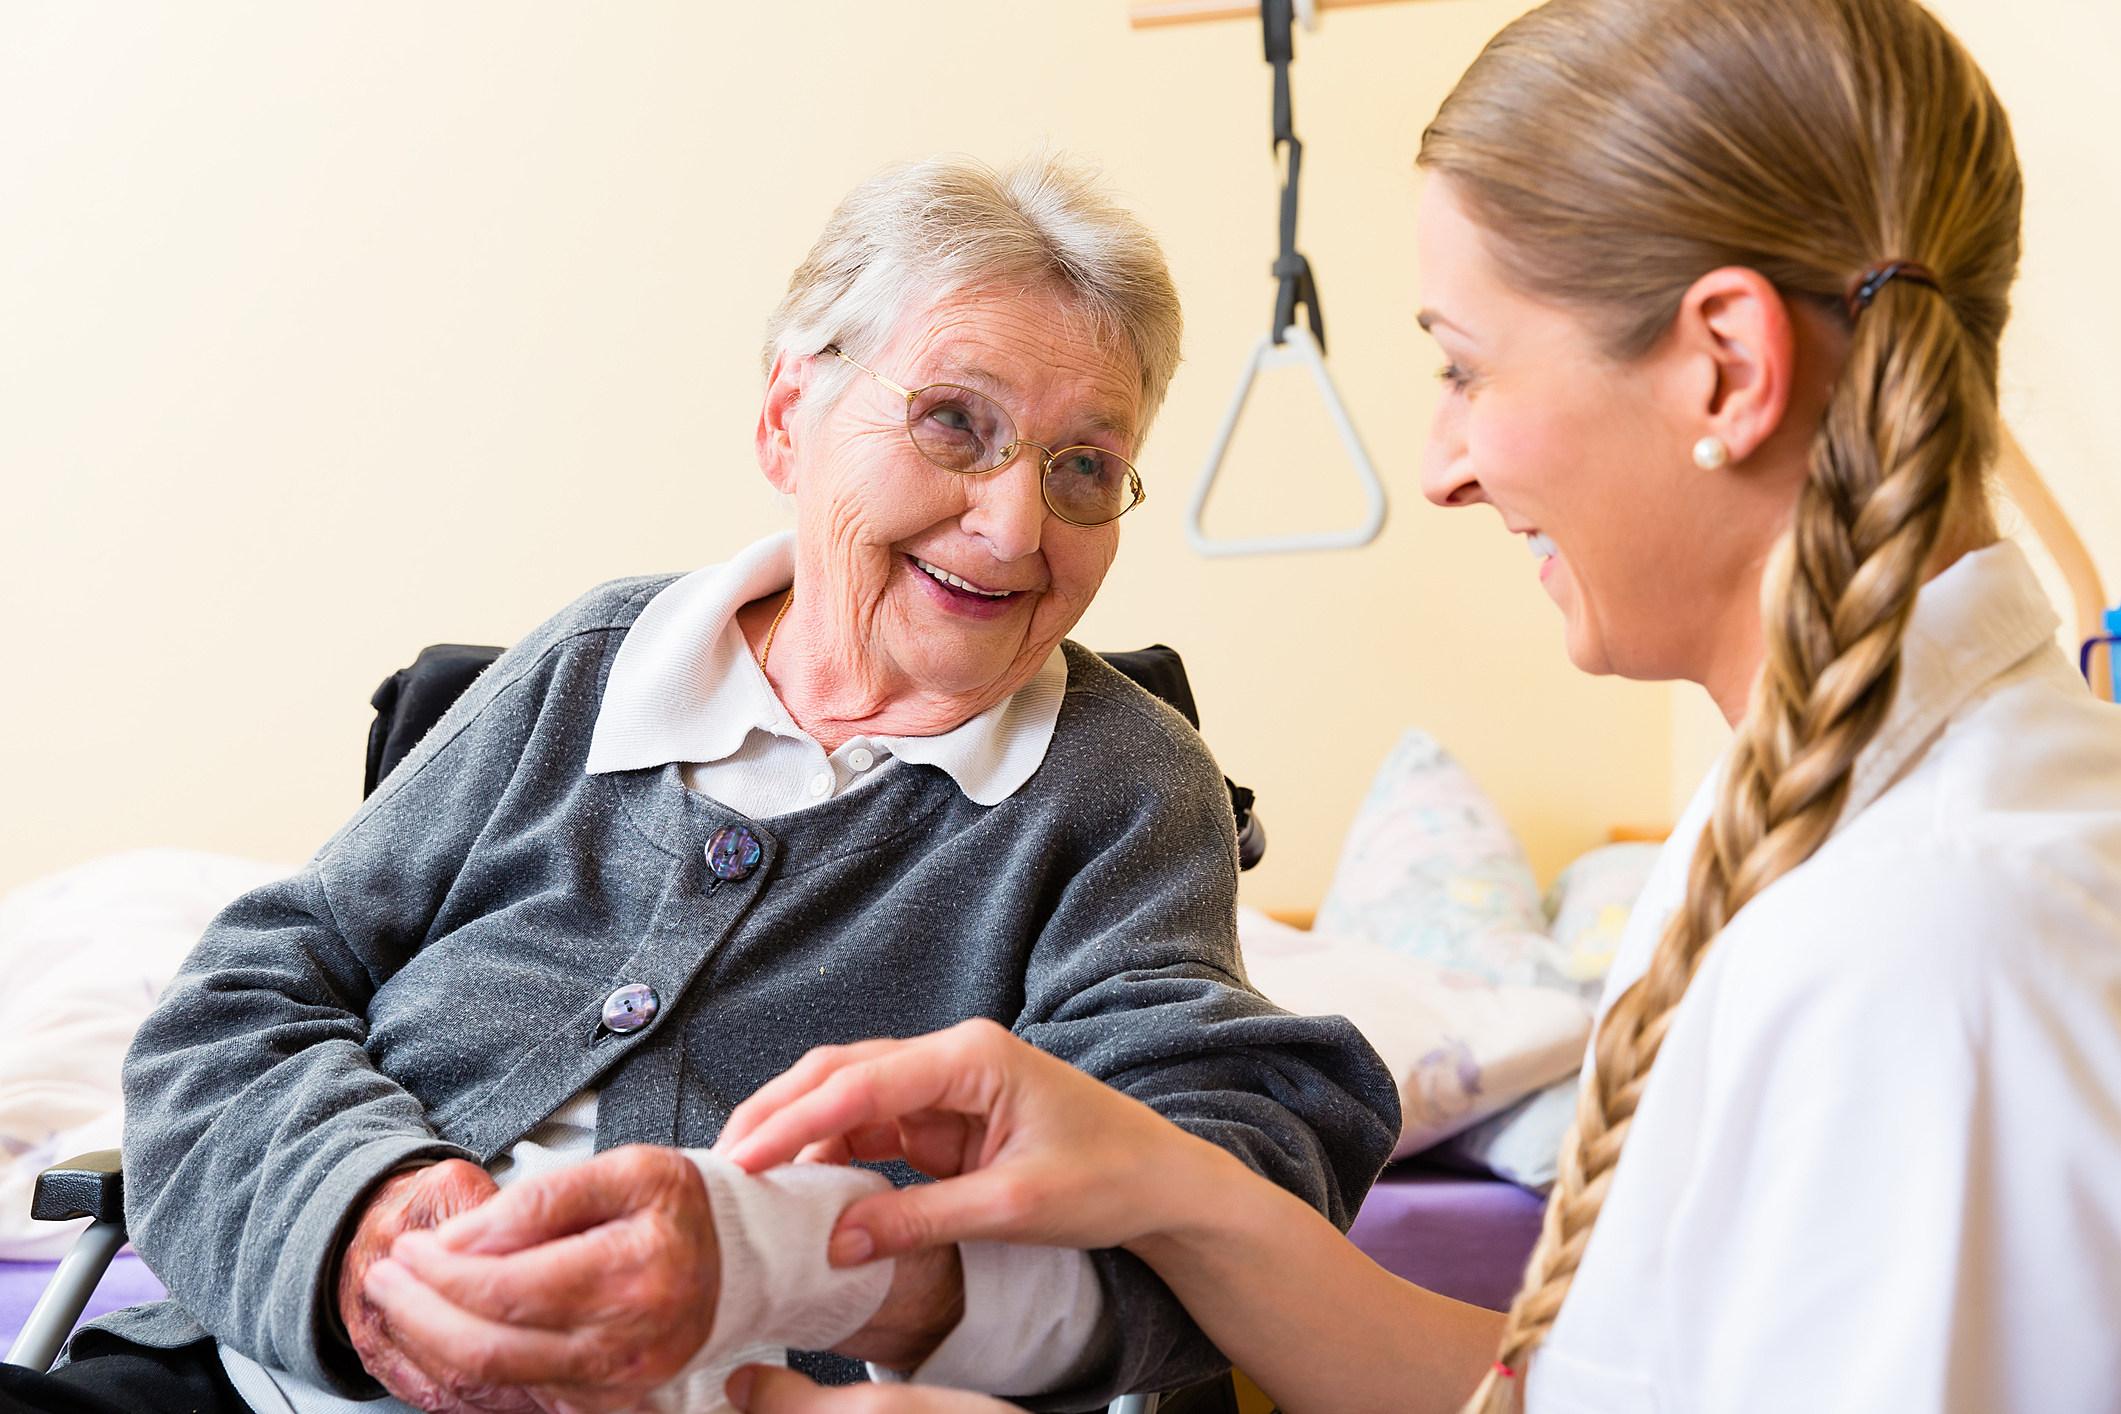 Liquidating assets before nursing home